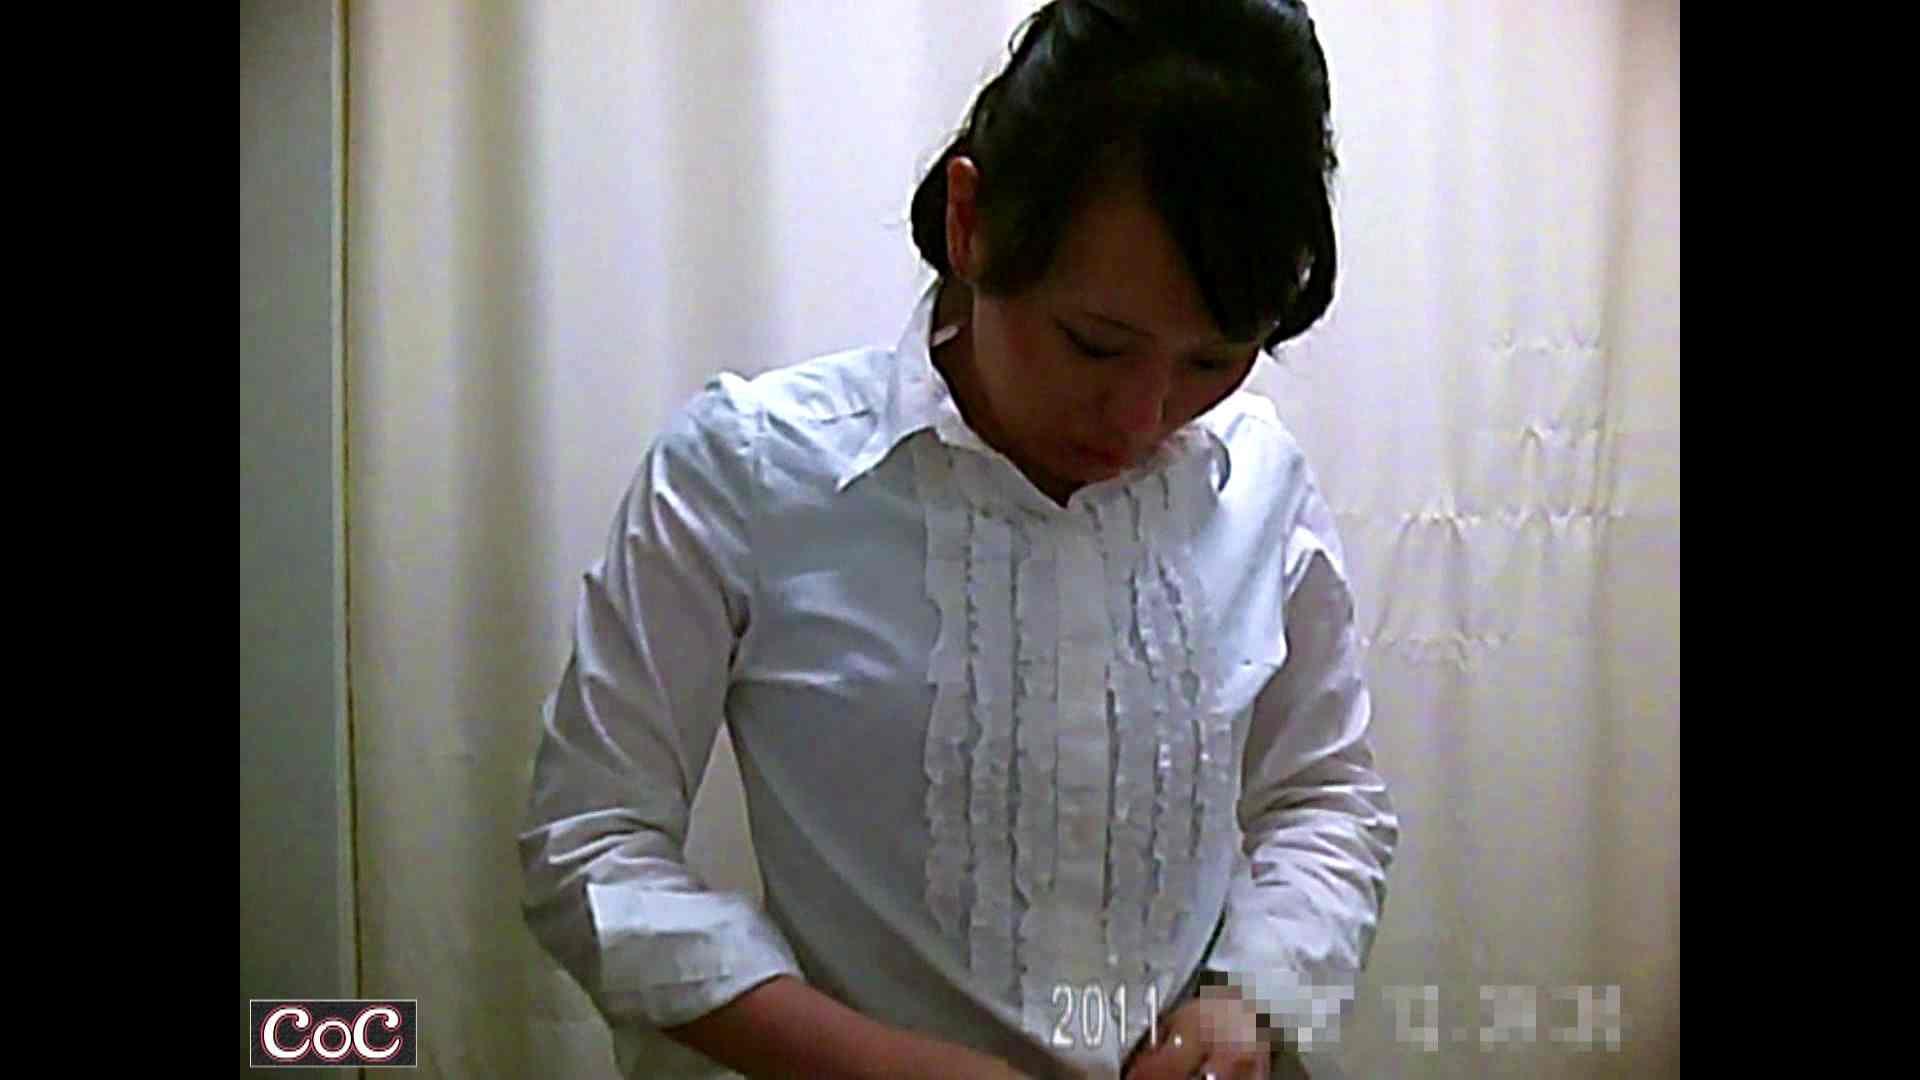 Doctor-X元医者による反抗vol.67 OL  53pic 9